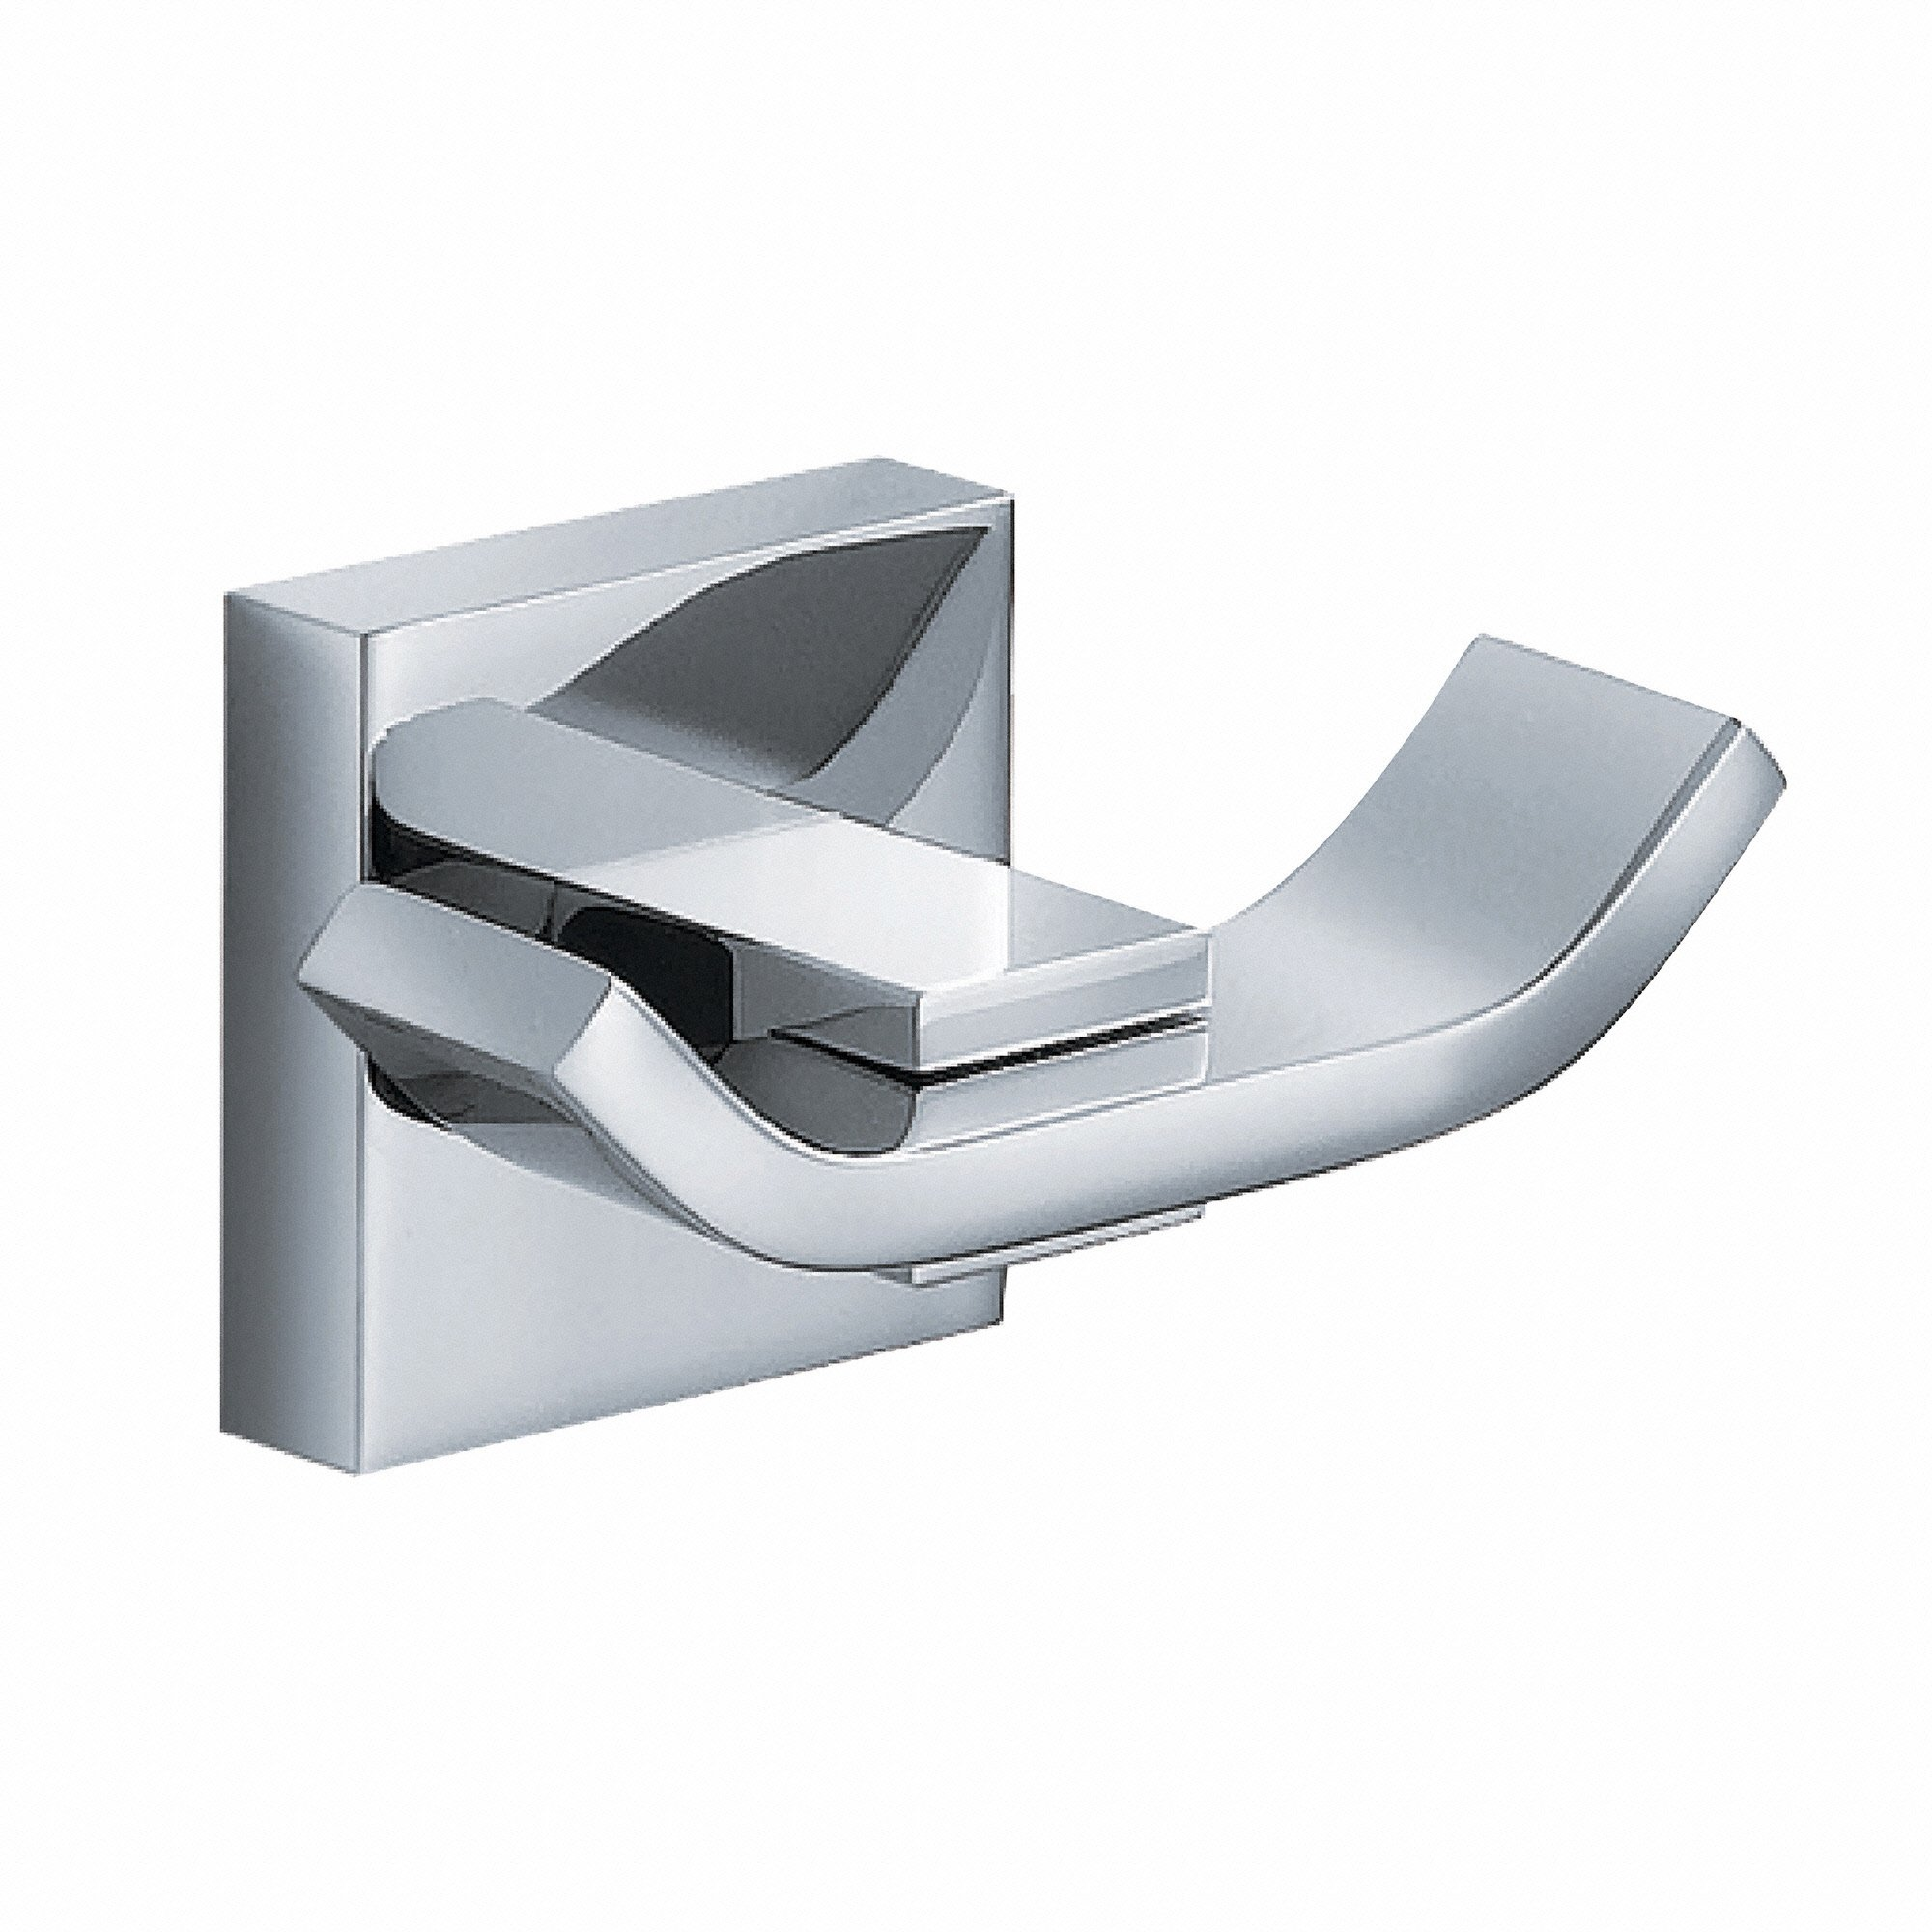 Kraus KEA-14401CH Aura Bathroom Accessories - Double Hook by Kraus